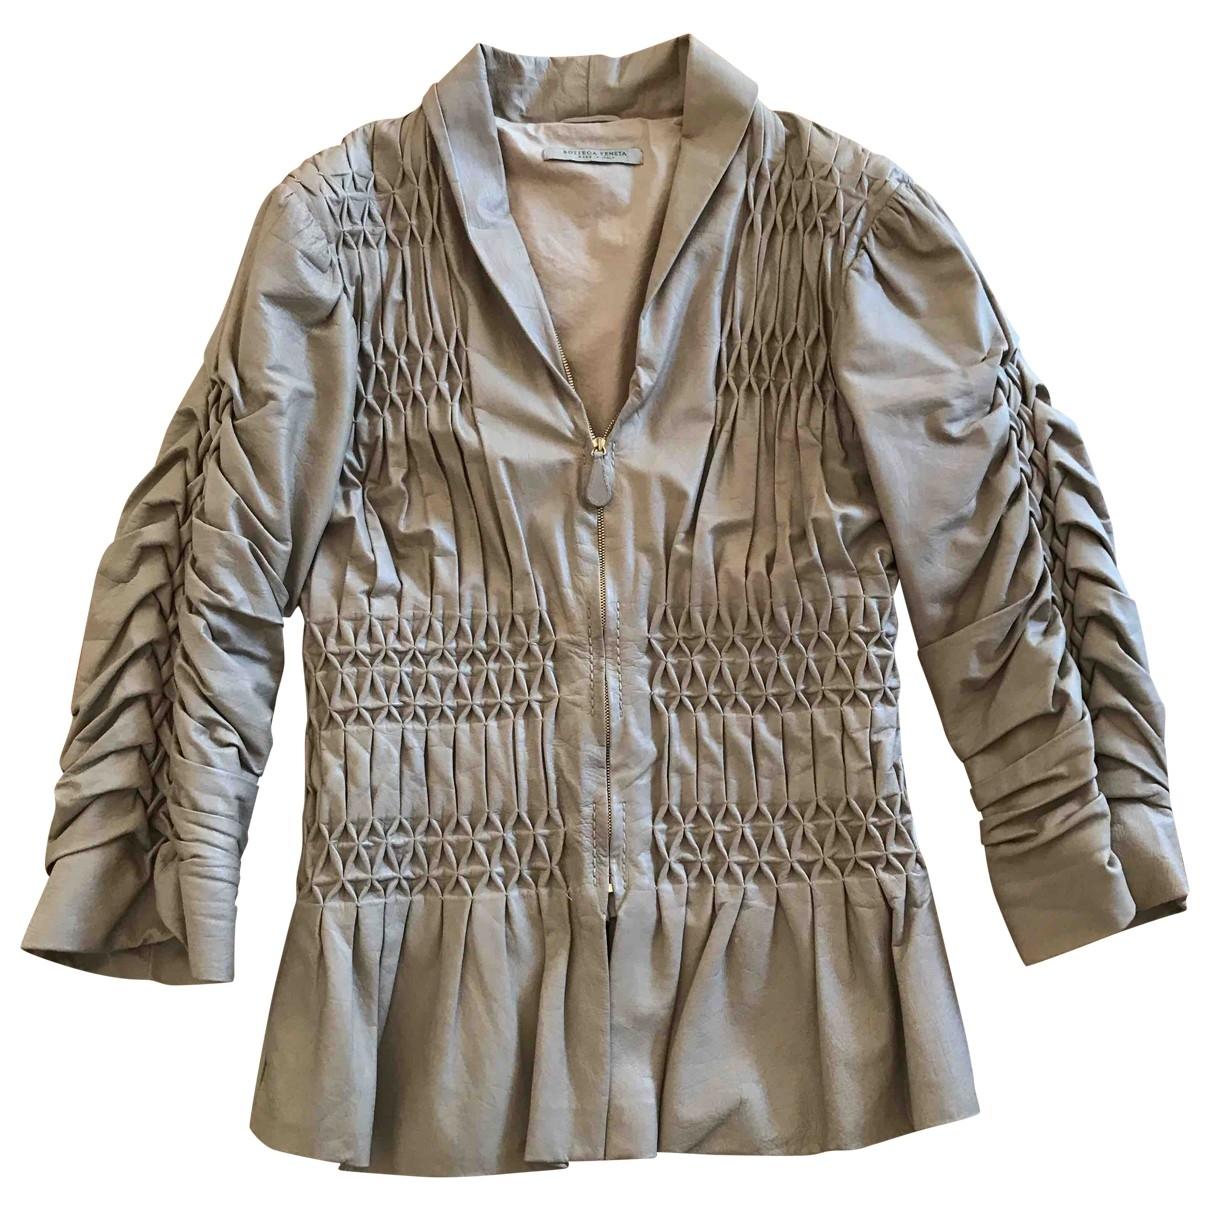 Bottega Veneta \N Khaki Leather jacket for Women 40 IT